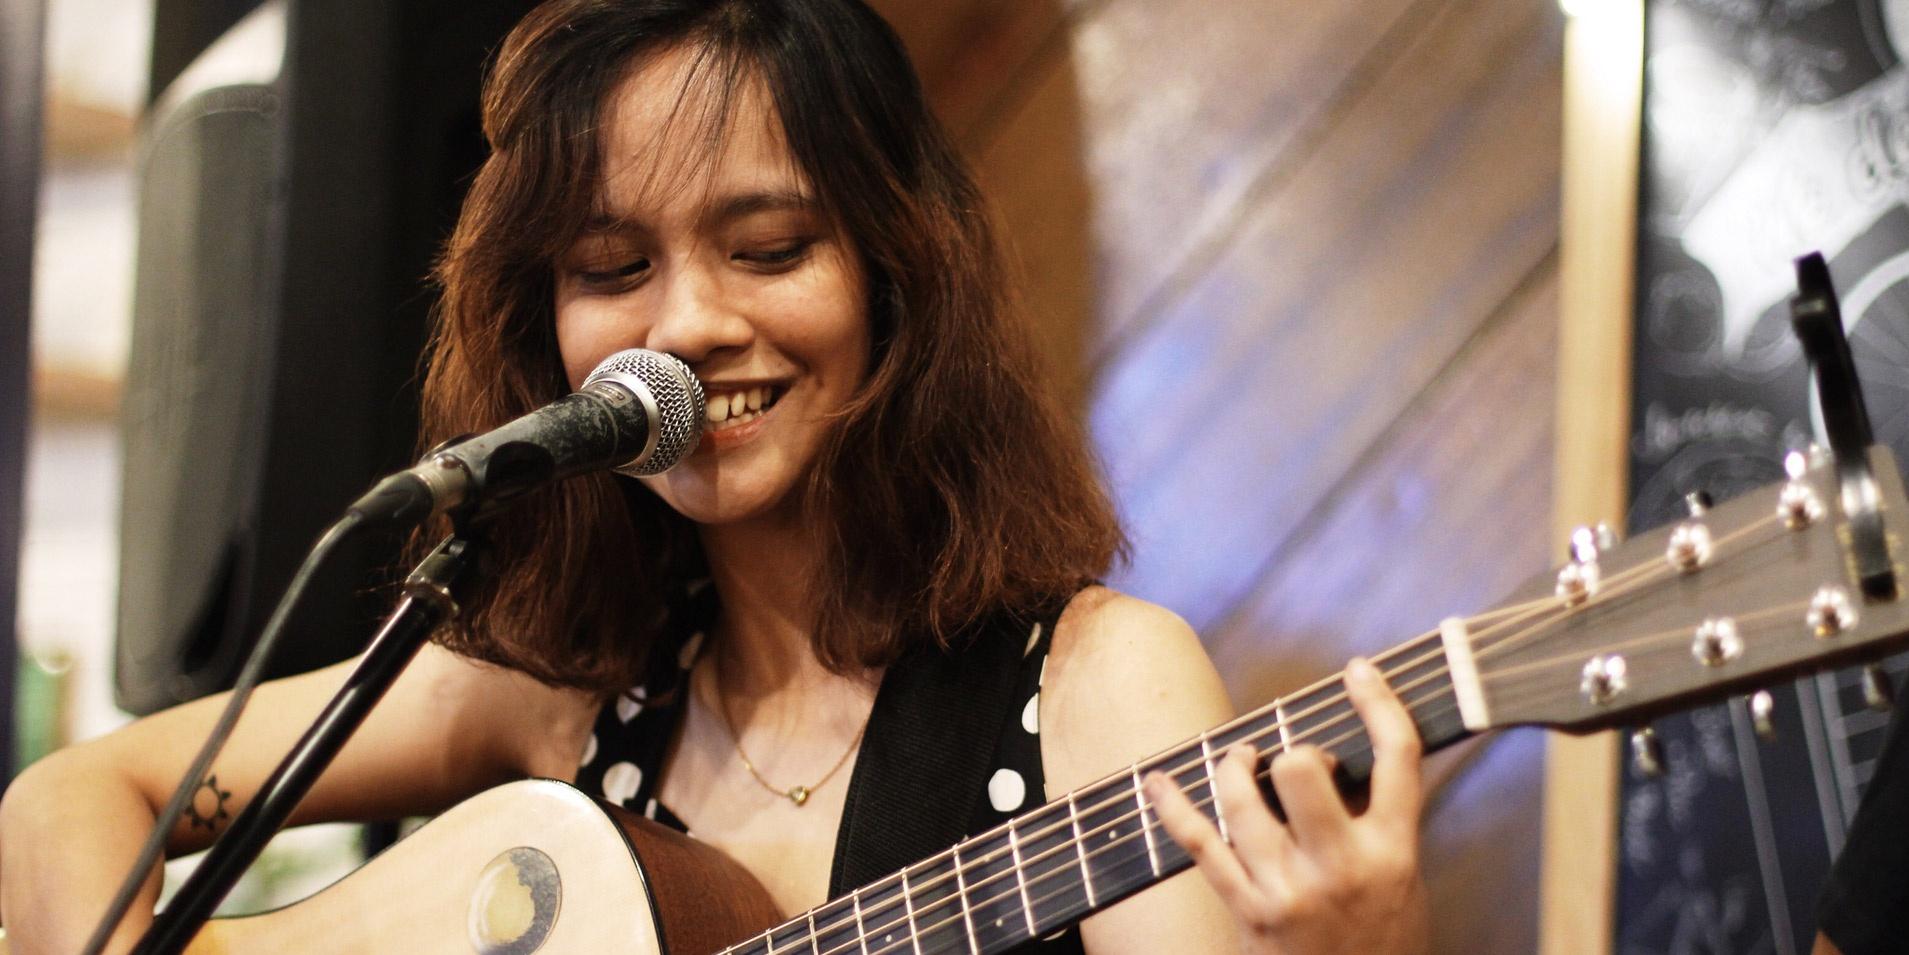 Mecca Music relaunches with singer-songwriter Tamara